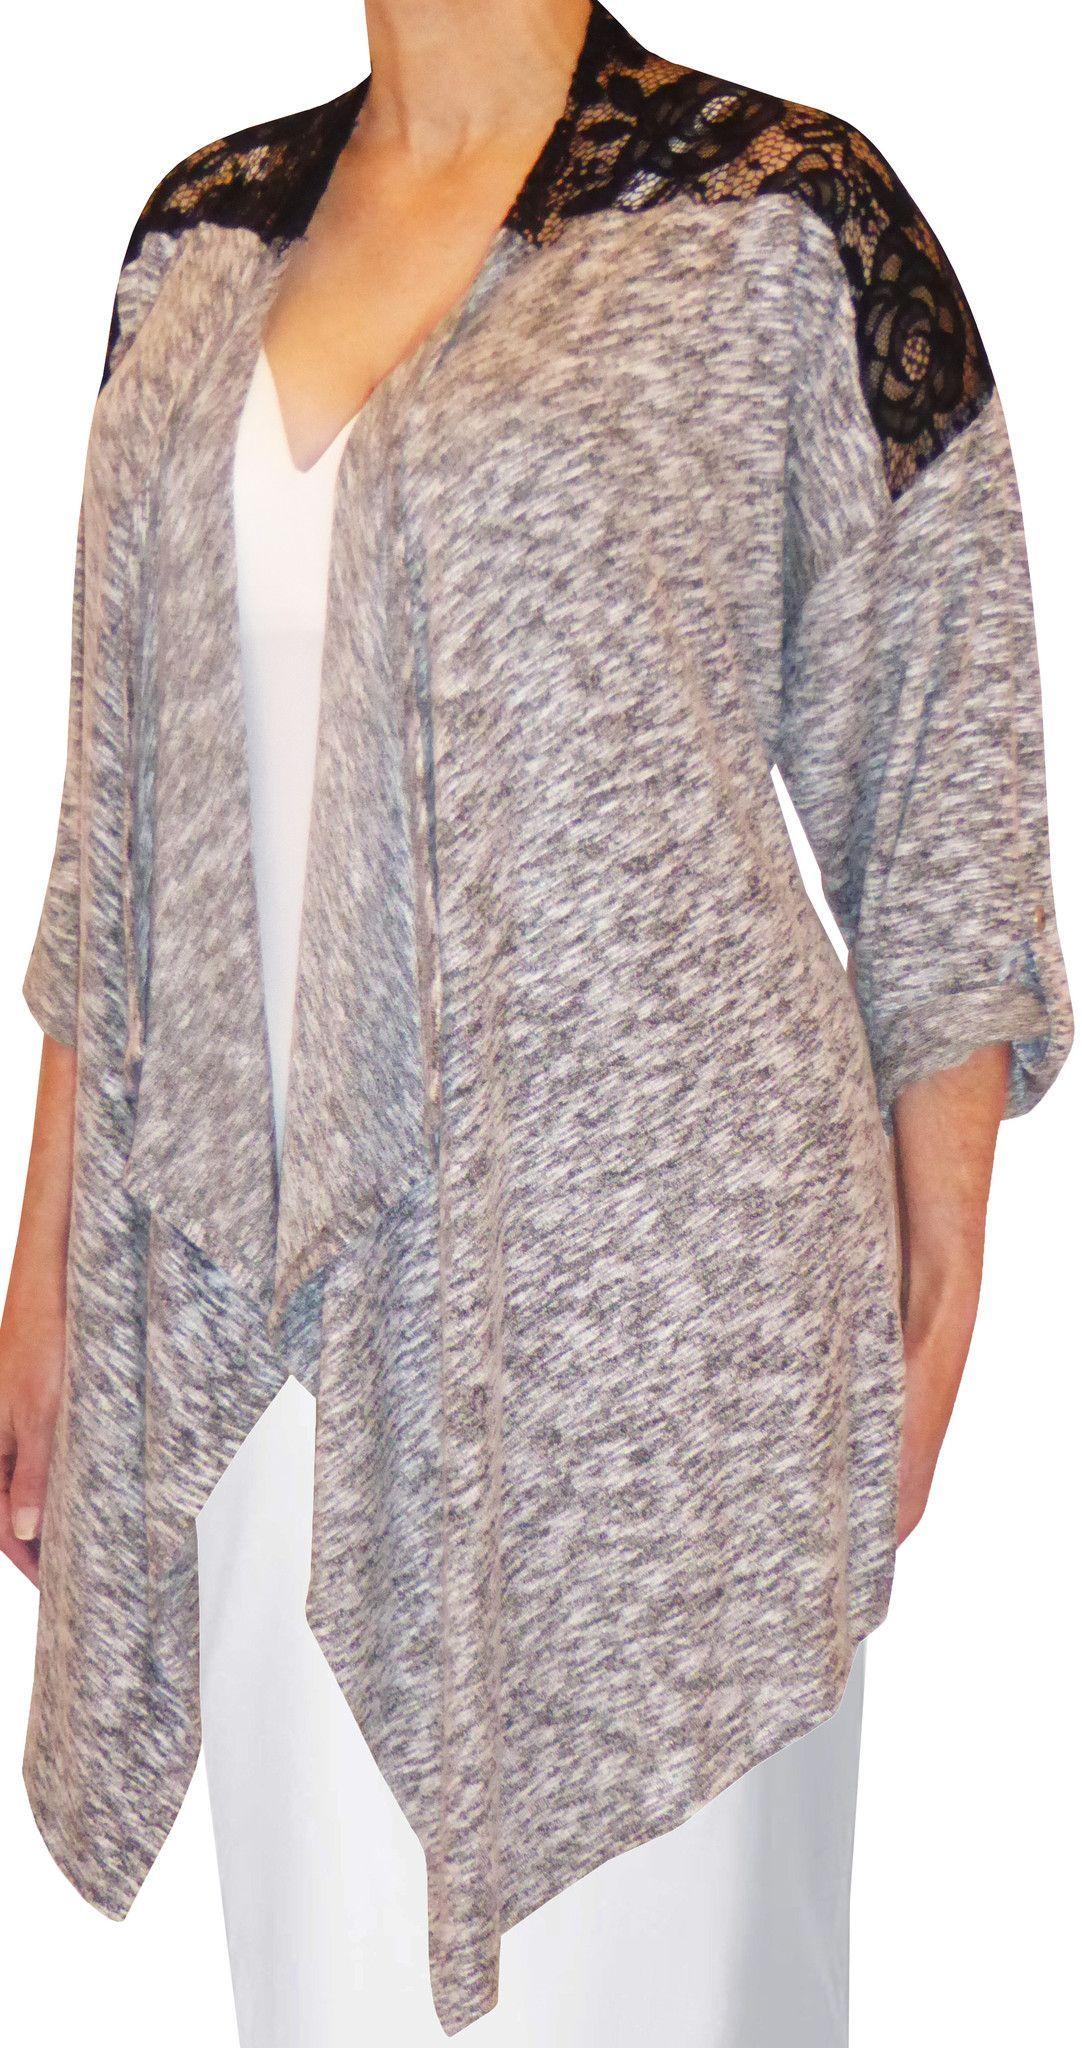 Funfash Plus Size Clothing Gray Black Lace Women's Cardigan ...